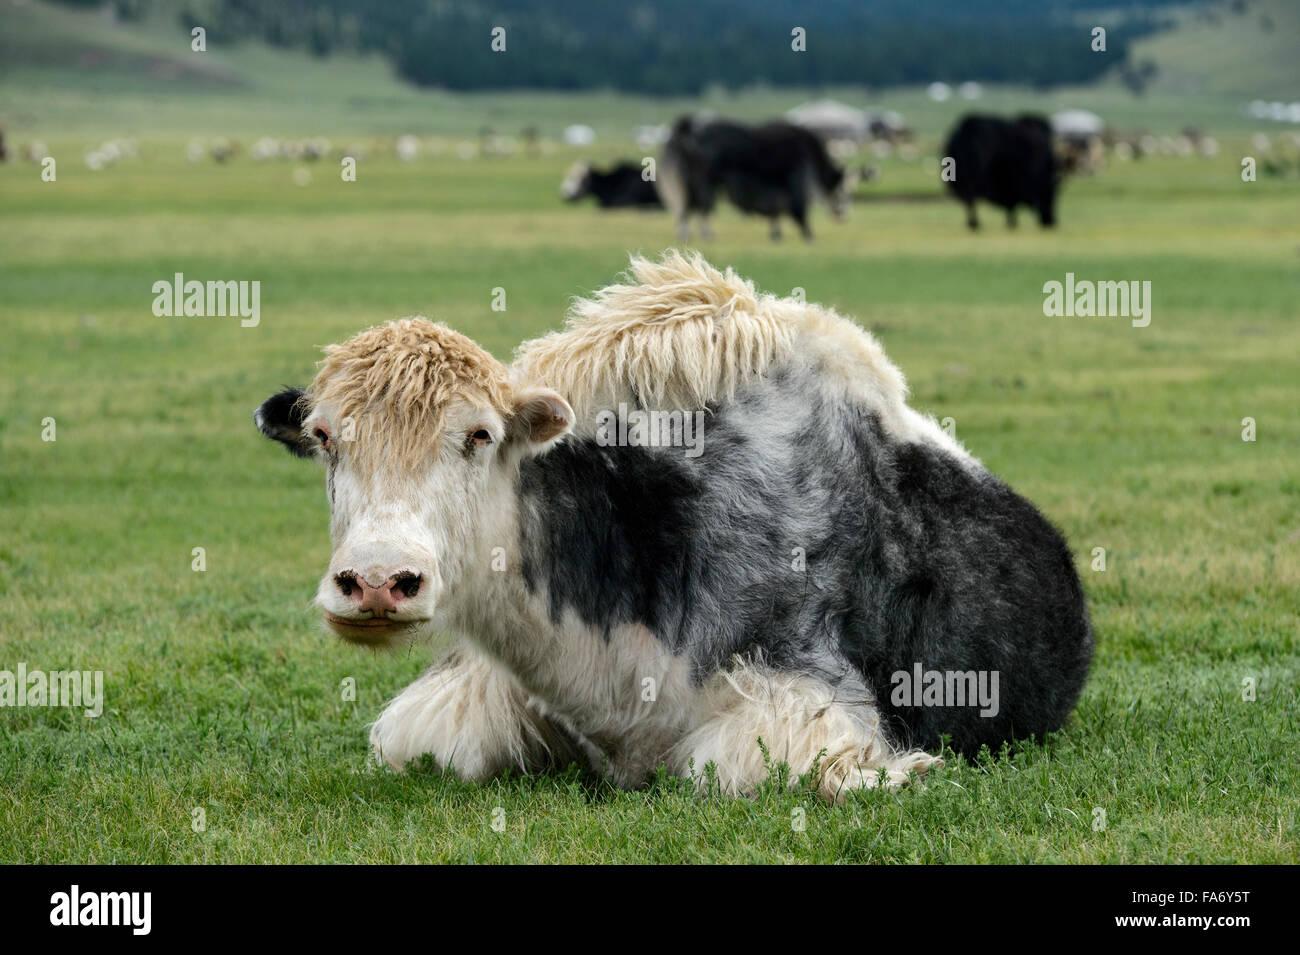 Black White yak (Bos mutus), Orkhon Valley, Khangai Nuruu National Park, Övörkhangai Aimag, Mongolia - Stock Image